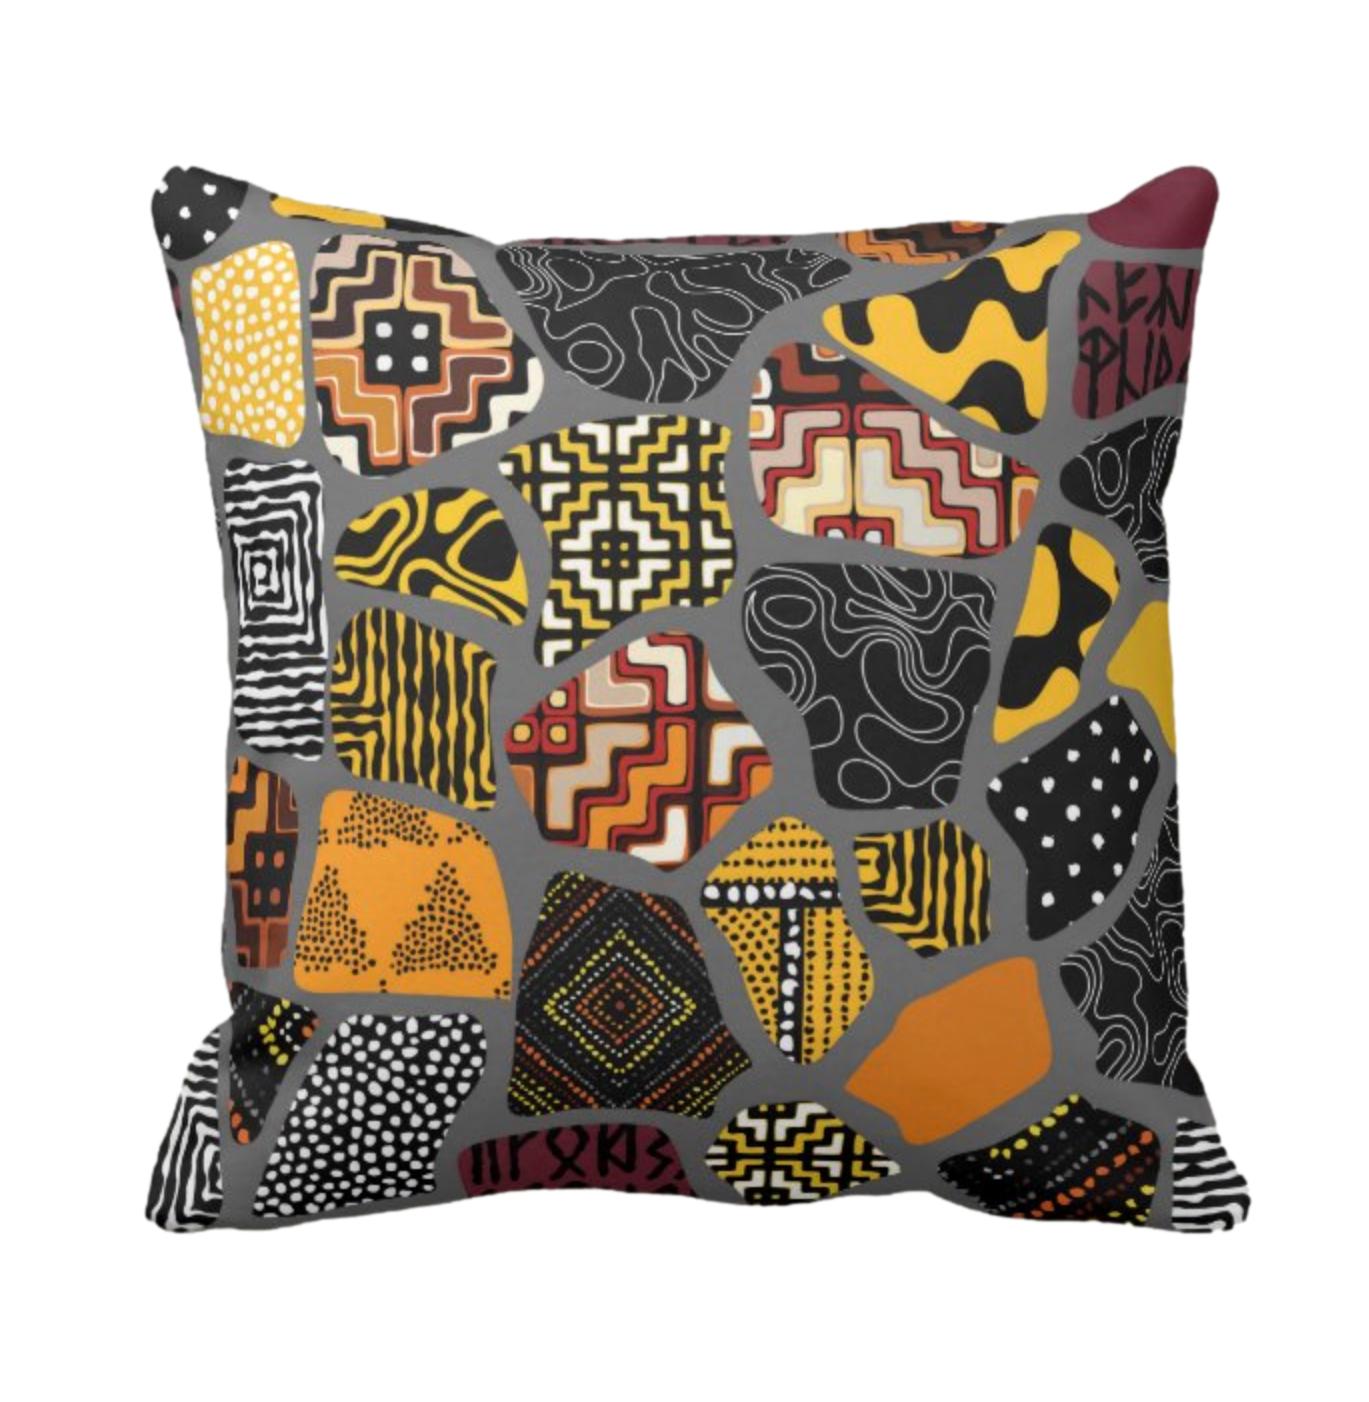 Afro Patchwork Print Design 1 Throw Cushion